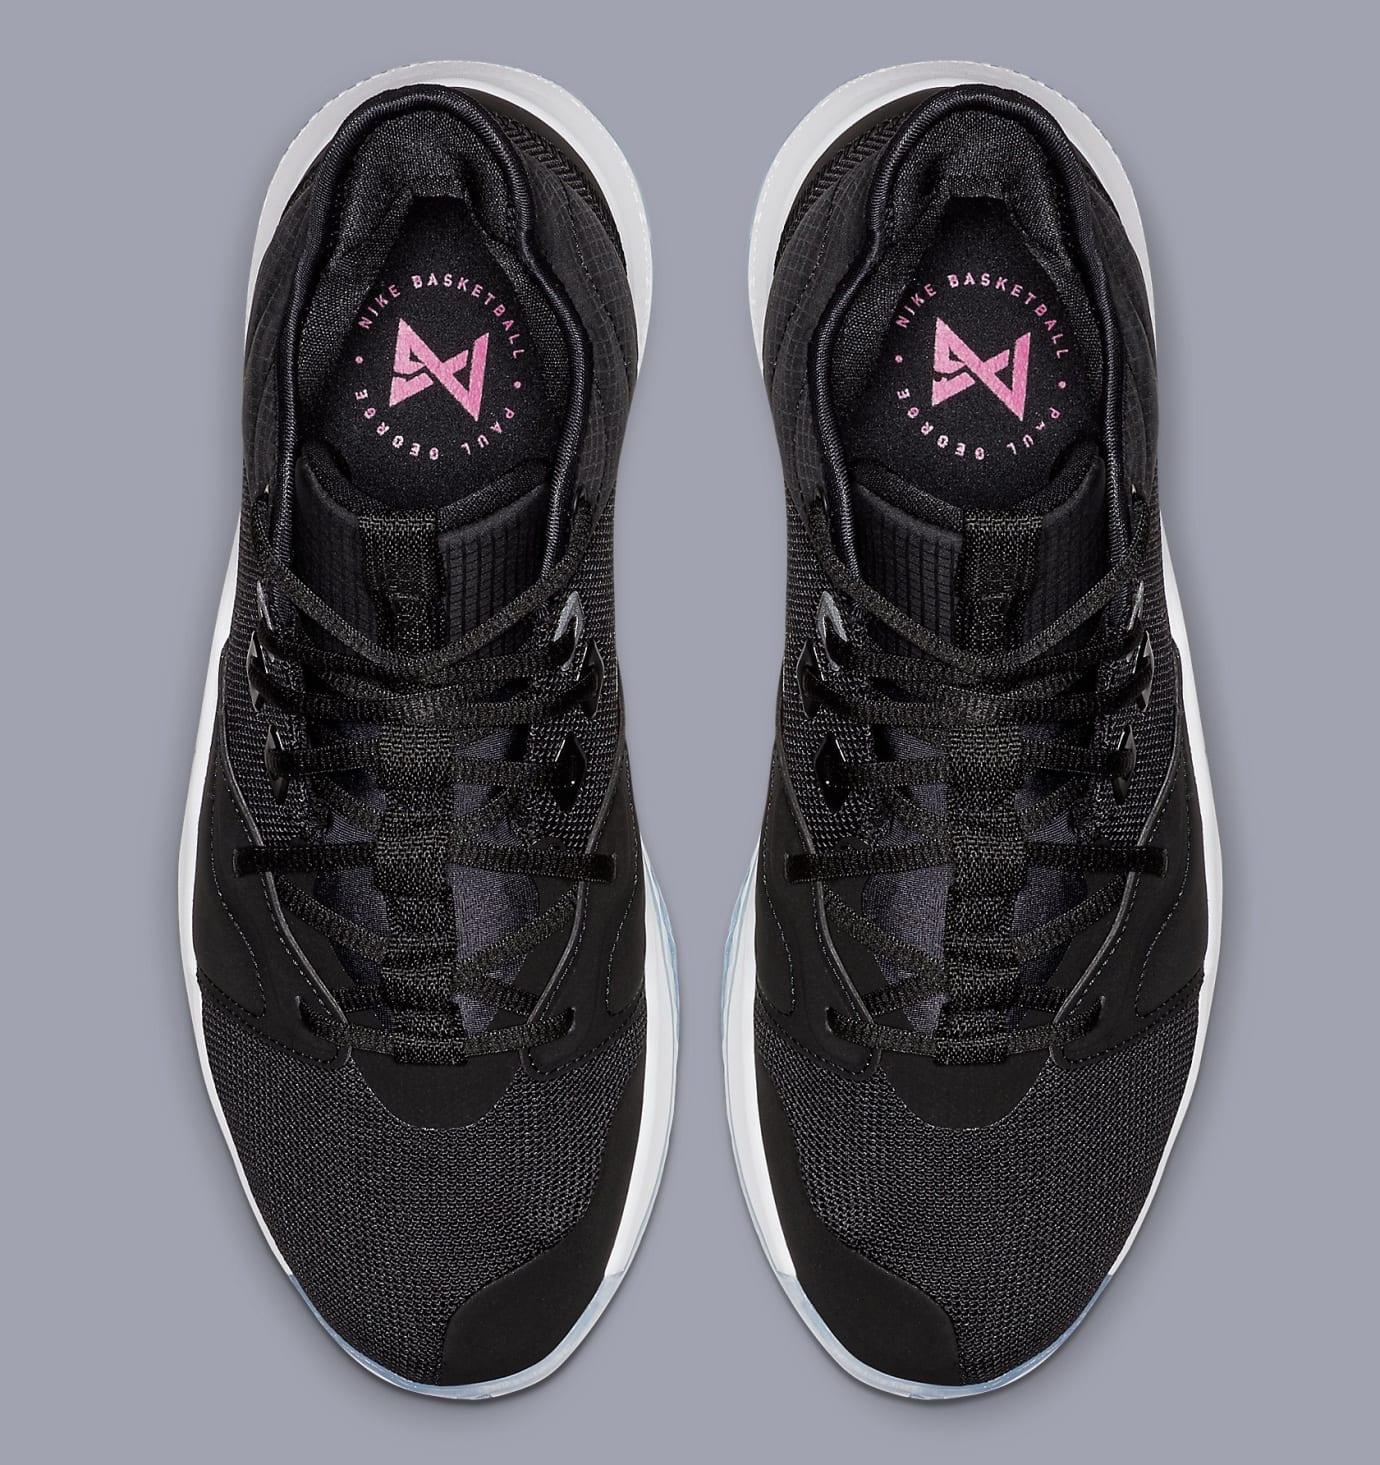 Nike PG 3 'Black/White-Laser Fuchsia' AO2607-001 Top